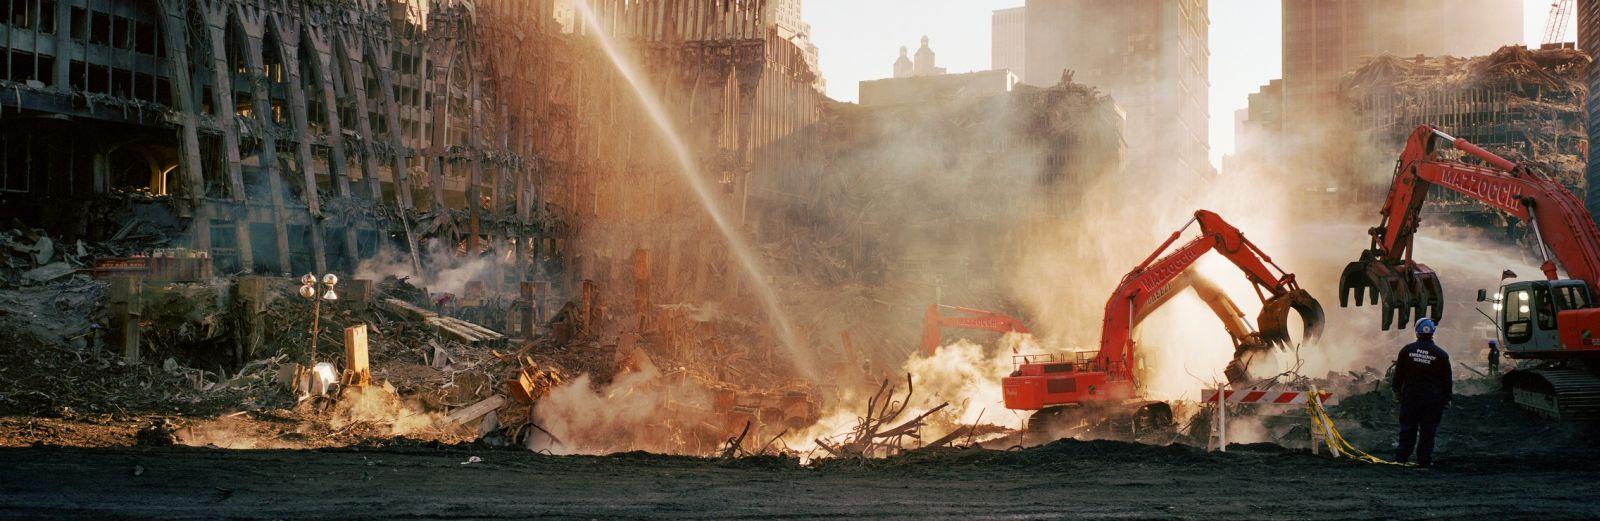 12. Wim Wenders New York, November 8, 2001, III © for the reproduced works and texts by Wim Wenders: Wim Wenders/Wenders Images/Verlag der Autoren 2001 C - Print 178 x 447 cm